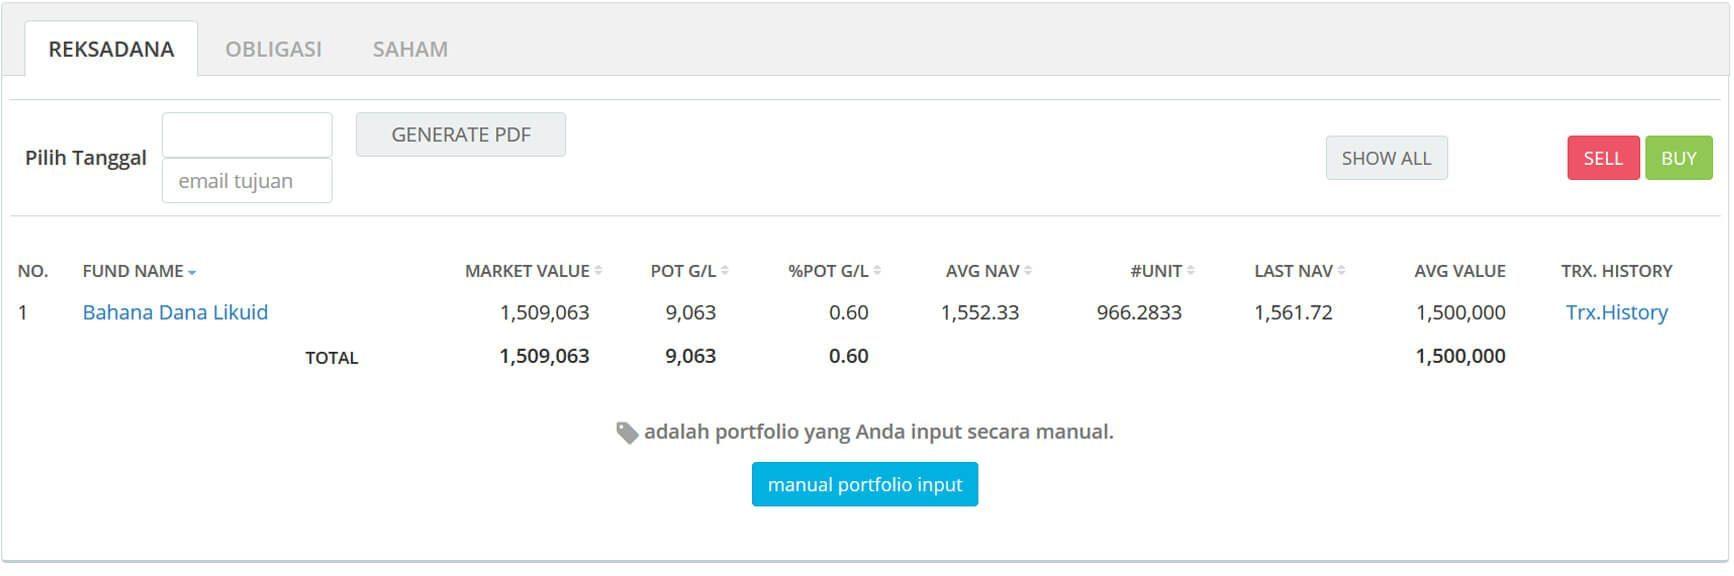 Screenshot Perkembangan Investasi Saham - Day 43, Senin, 24 Februari 2020 BDL